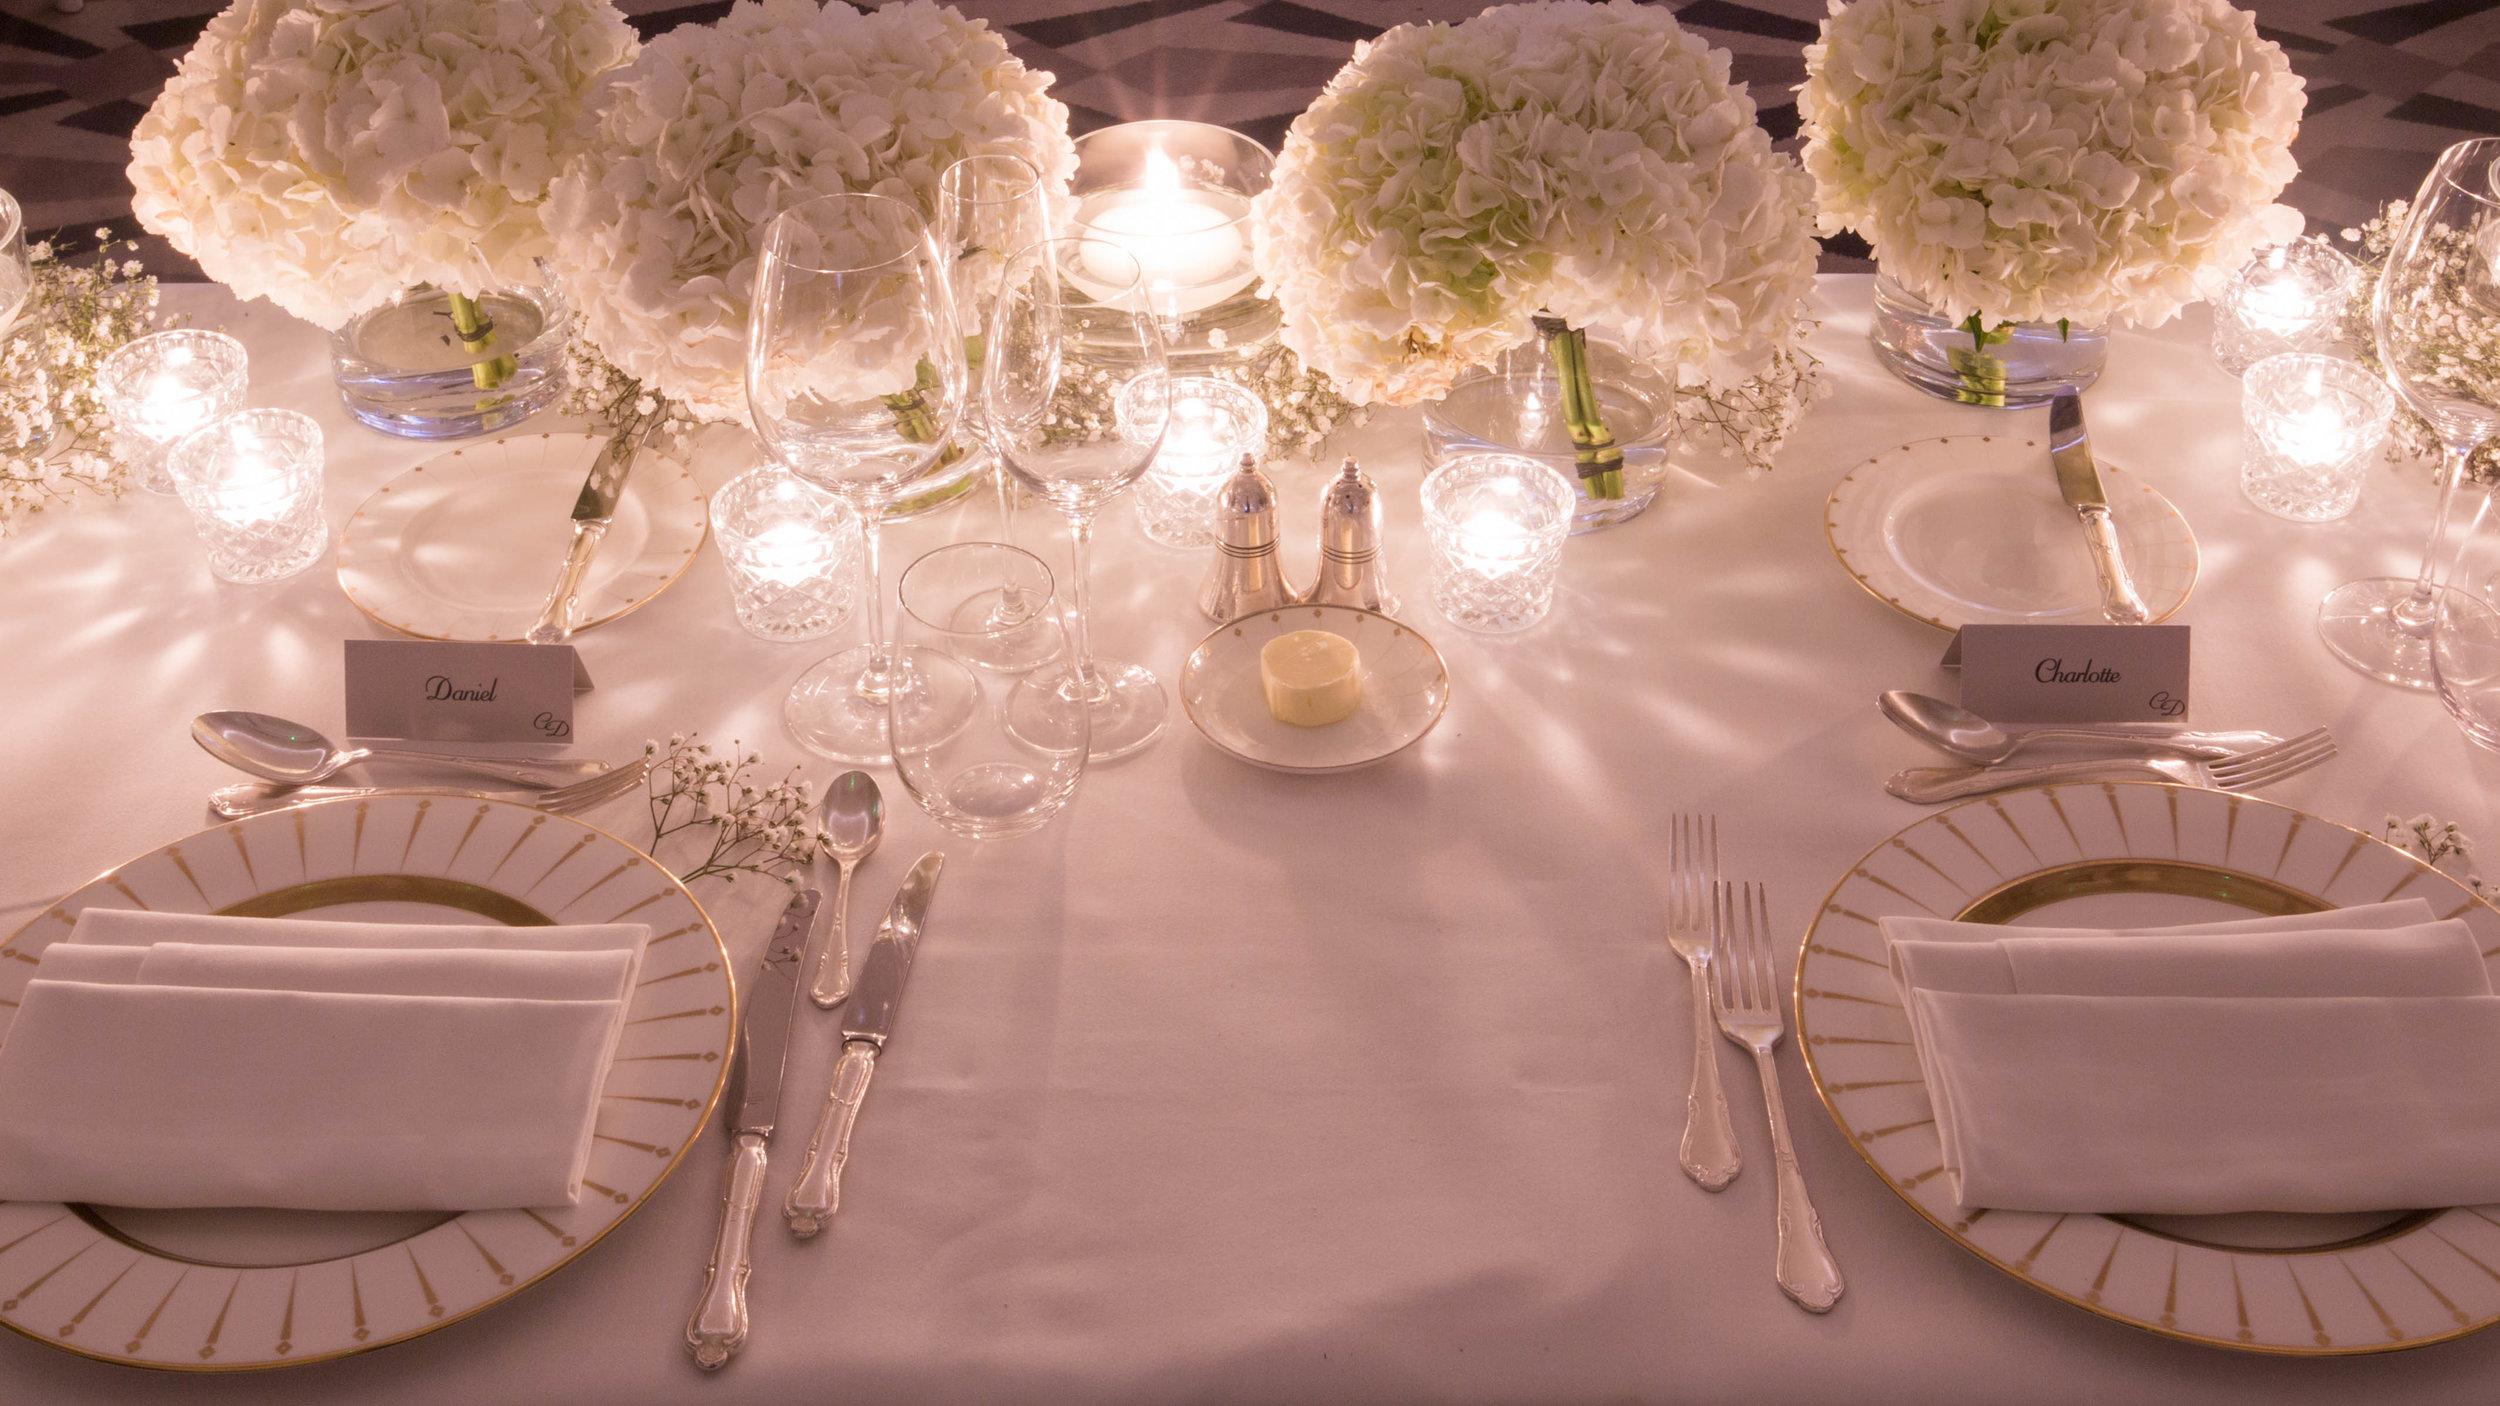 claridges-hotel-wedding-photographer-london-mayfair-natalia-smith-photography-100.jpg